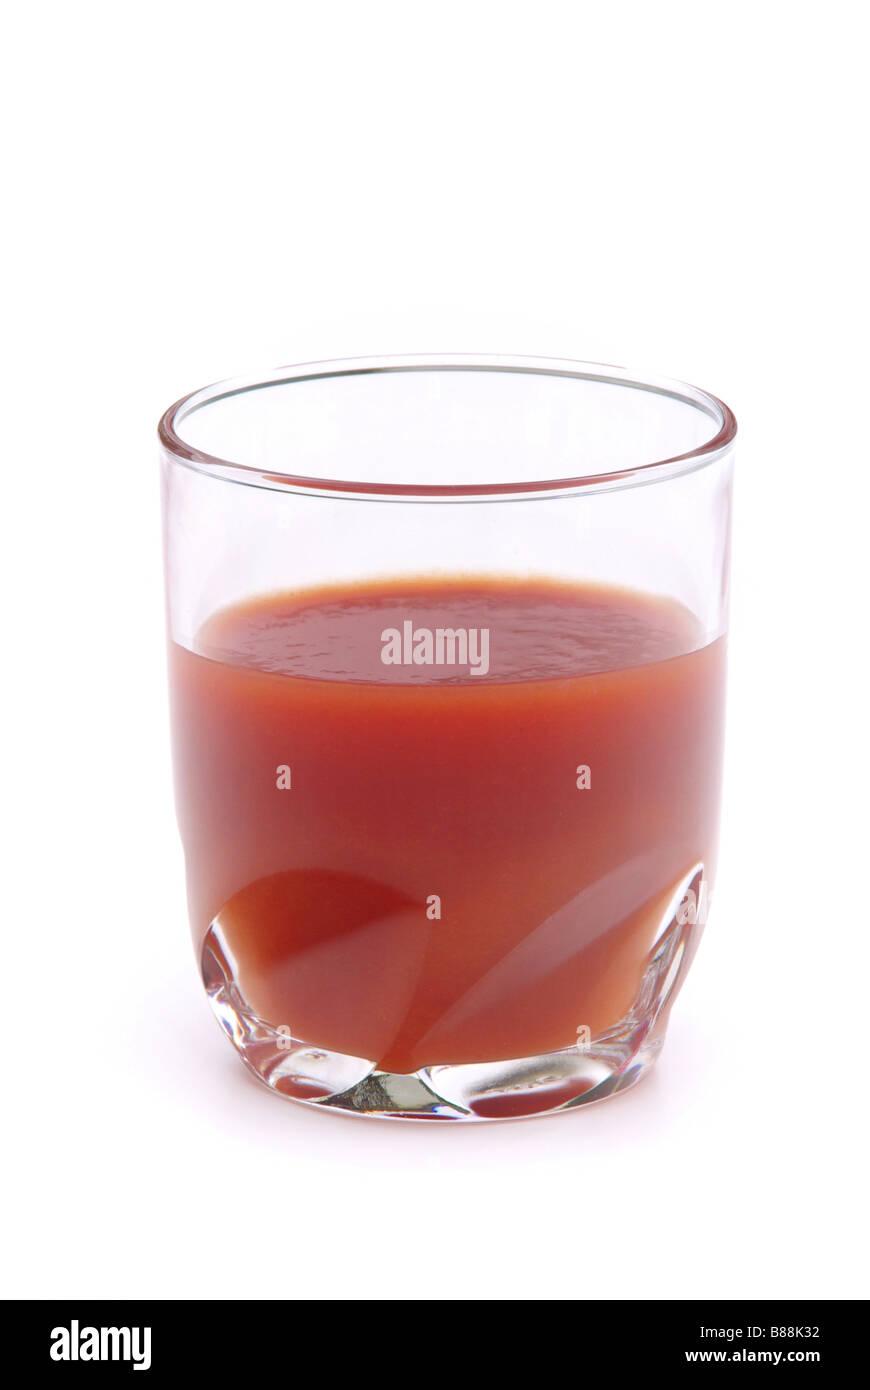 Tomatensaft tomato juice 09 - Stock Image